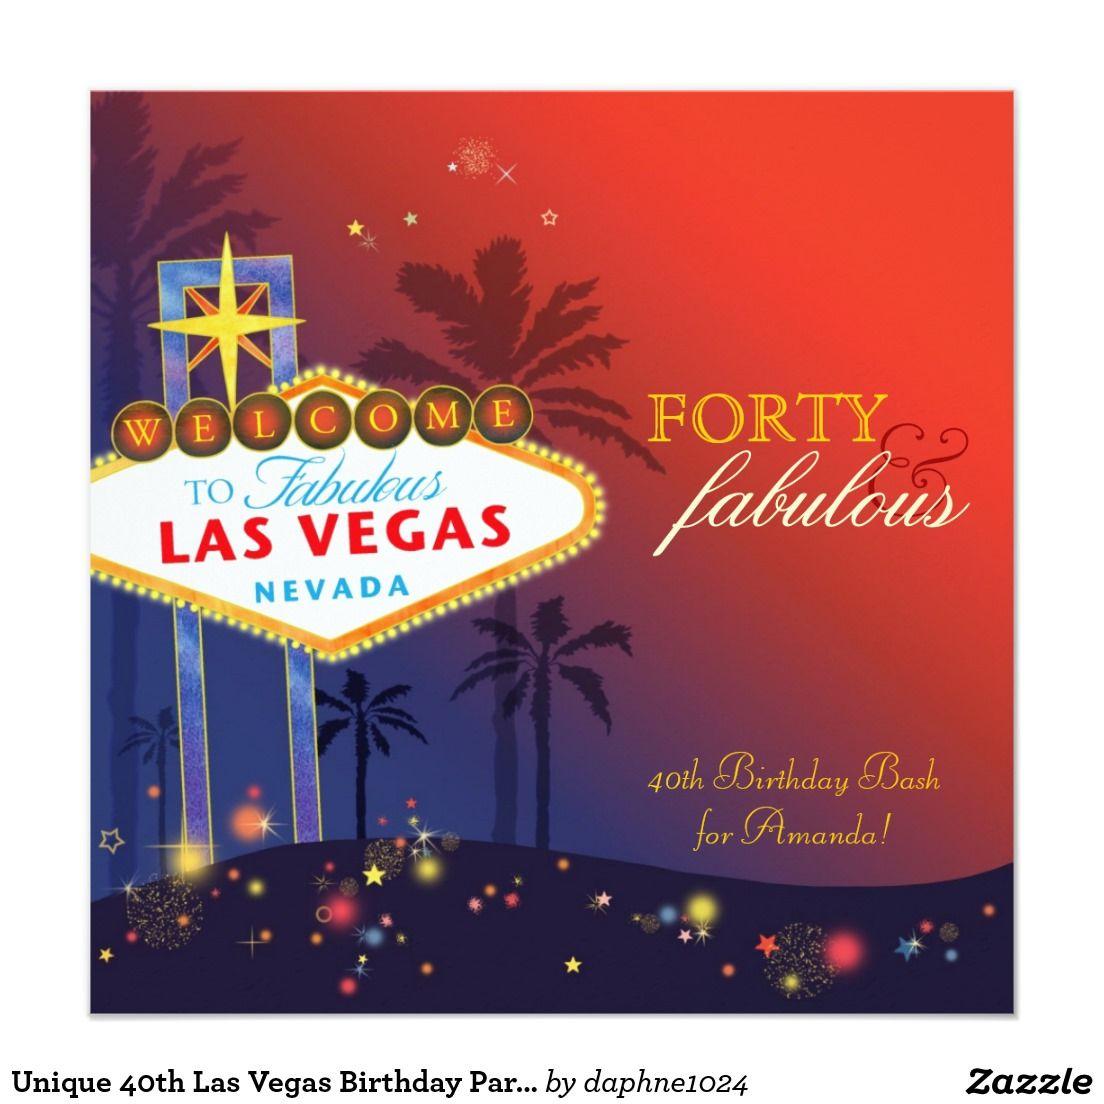 Unique 40th Las Vegas Birthday Party Invitation | 40th Birthday ...